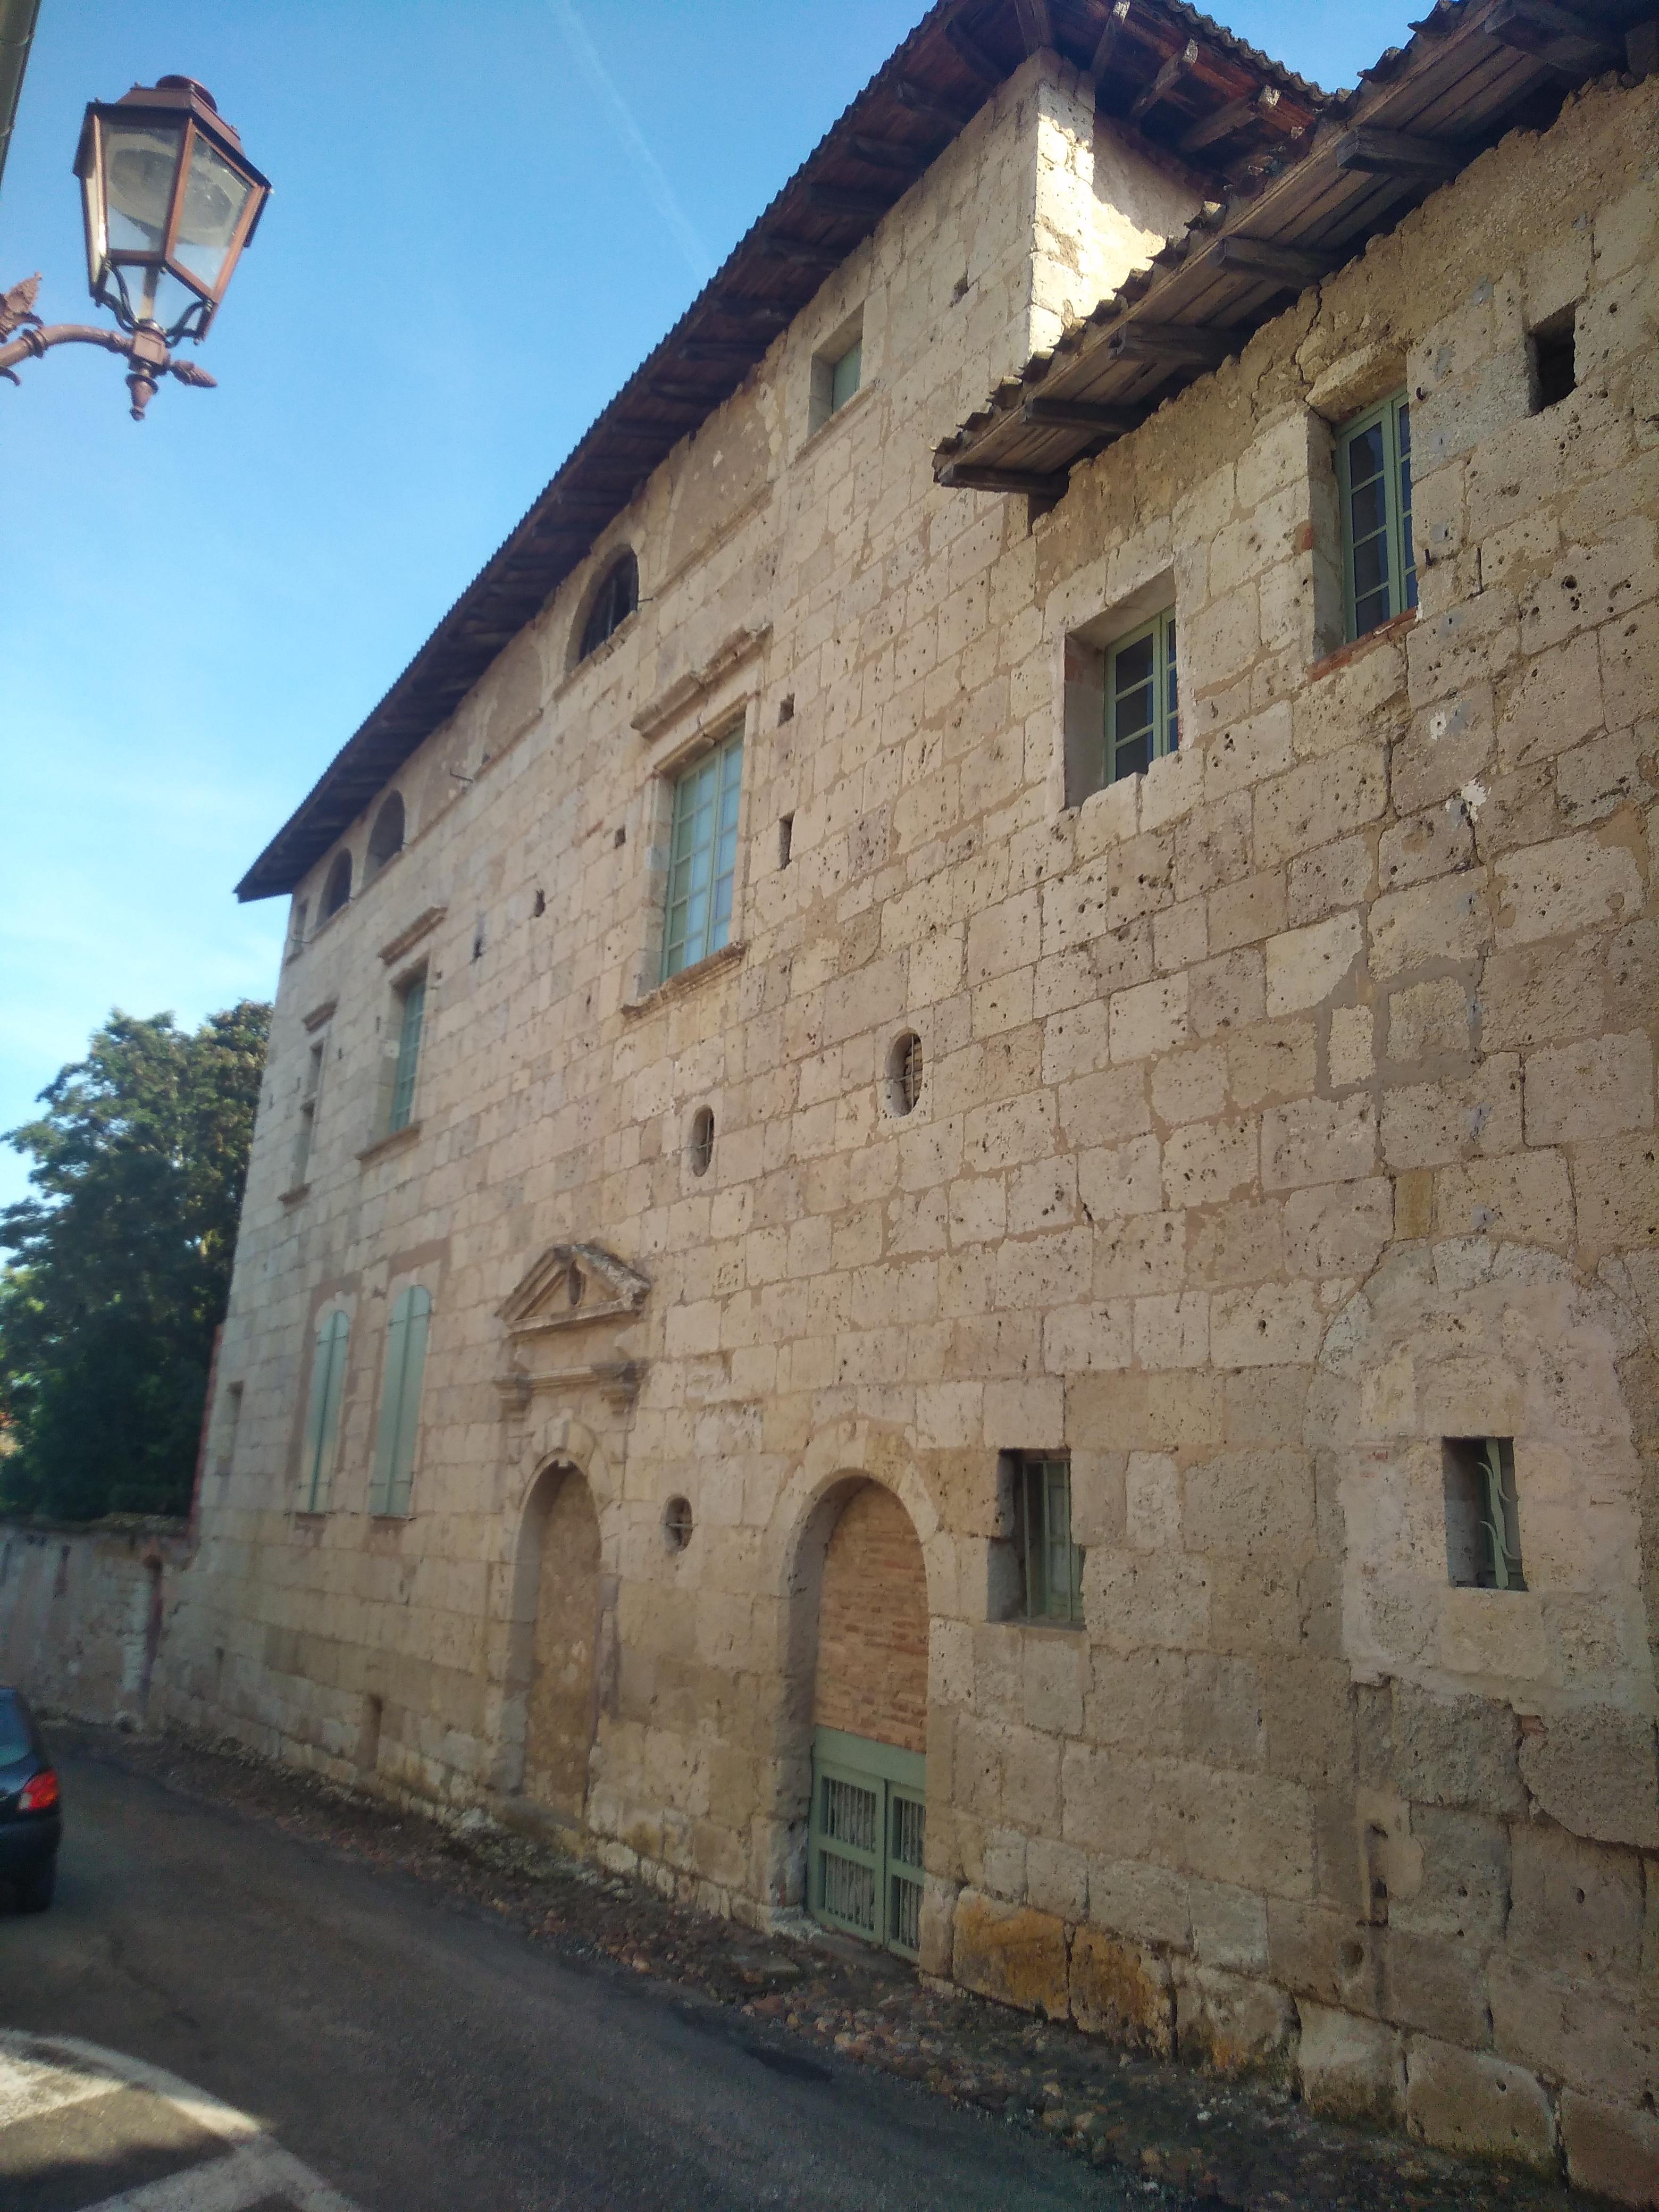 File:Larrazet - maison ancienne 02.jpg - Wikimedia Commons